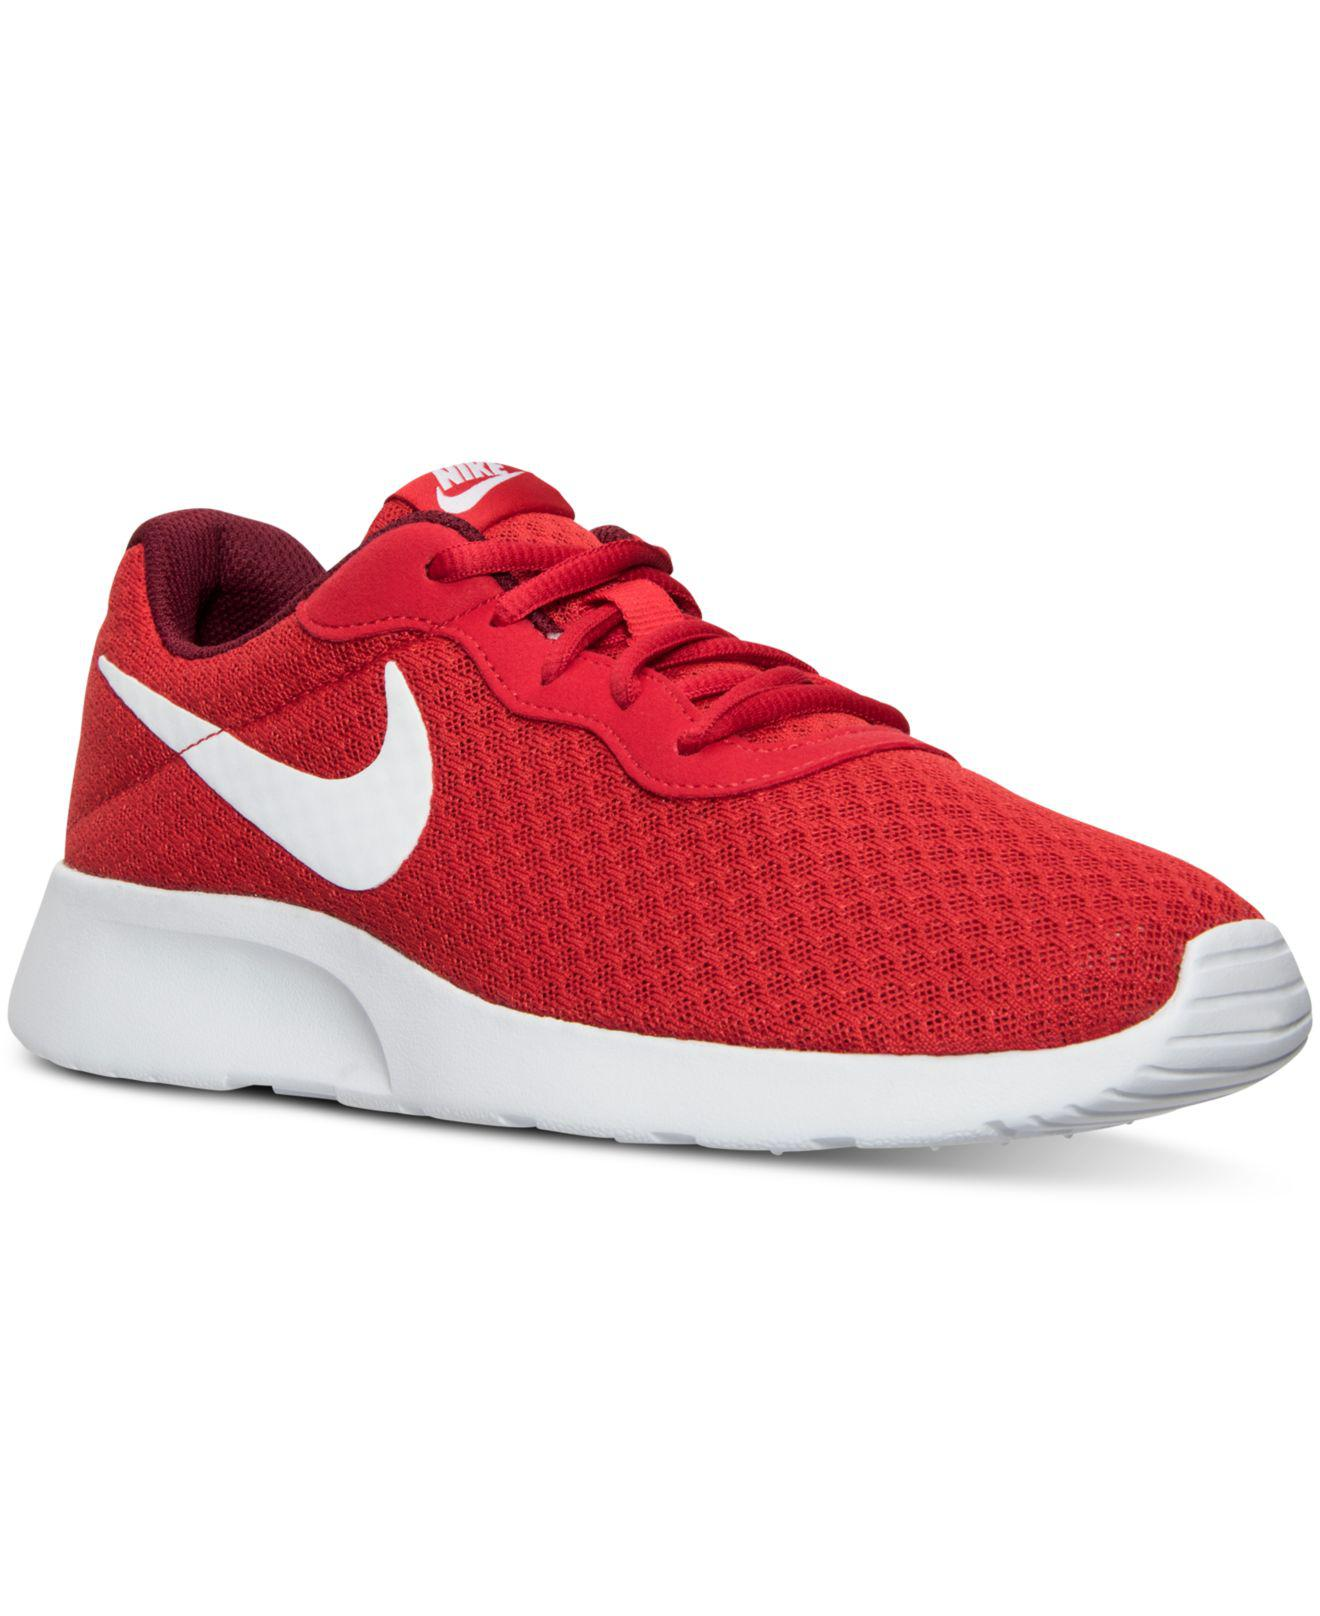 Nike. Men's Red Tanjun Casual Sneakers From Finish Line